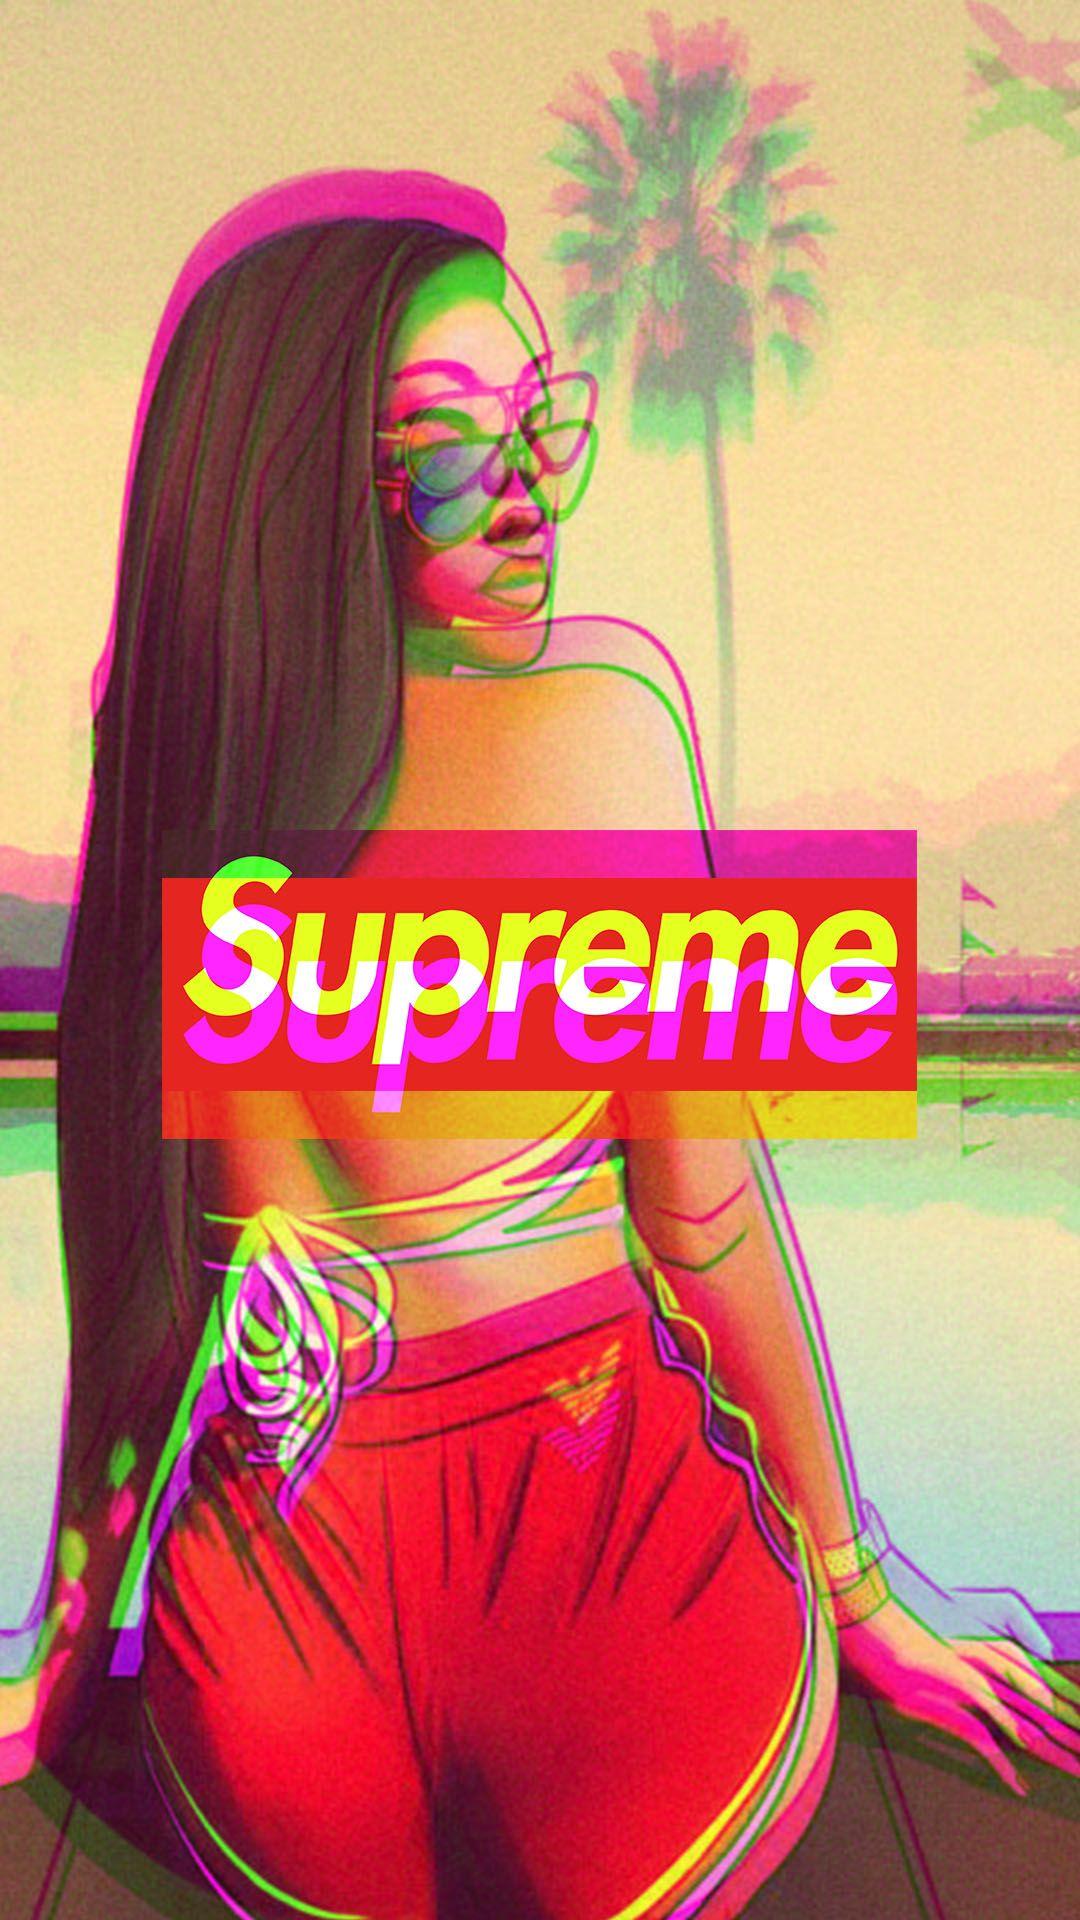 Free download Supreme Wallpaper Nike Wallpaper Screen ...